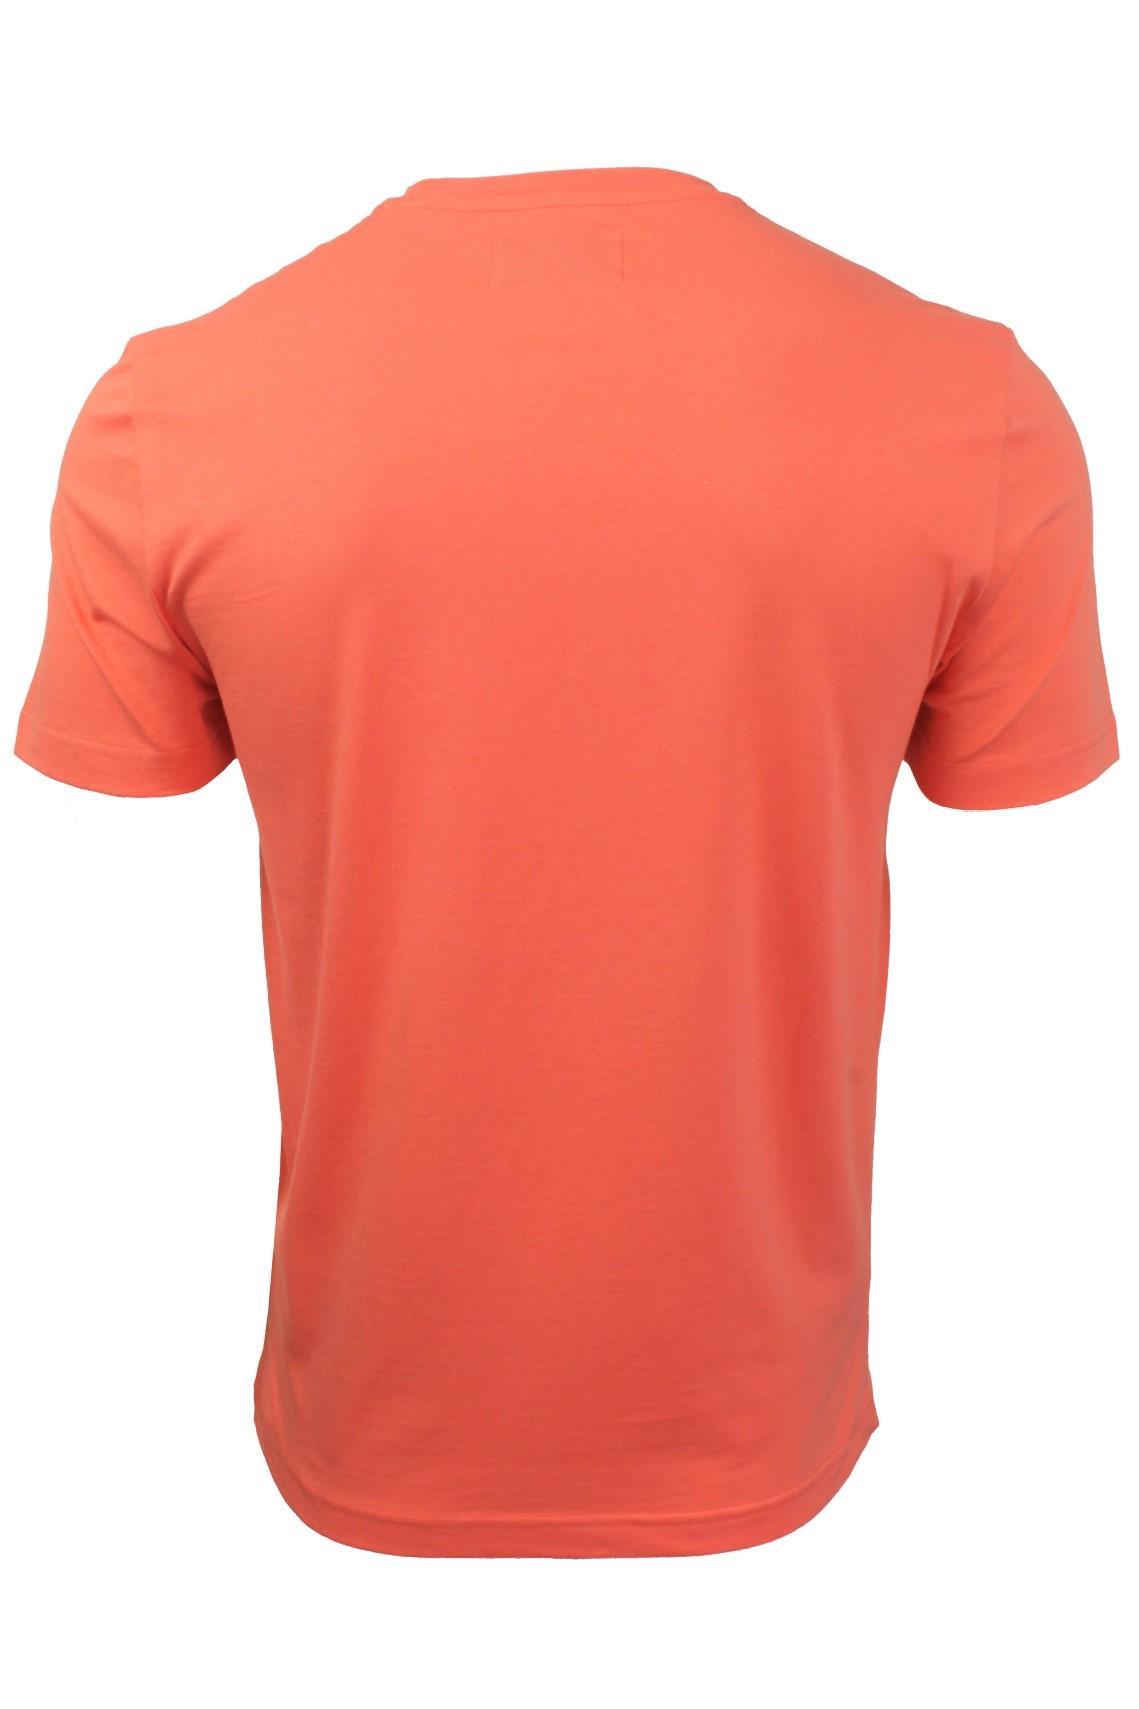 Mens-T-Shirt-by-Original-Penguin-Crew-Neck-Short-Sleeved thumbnail 32